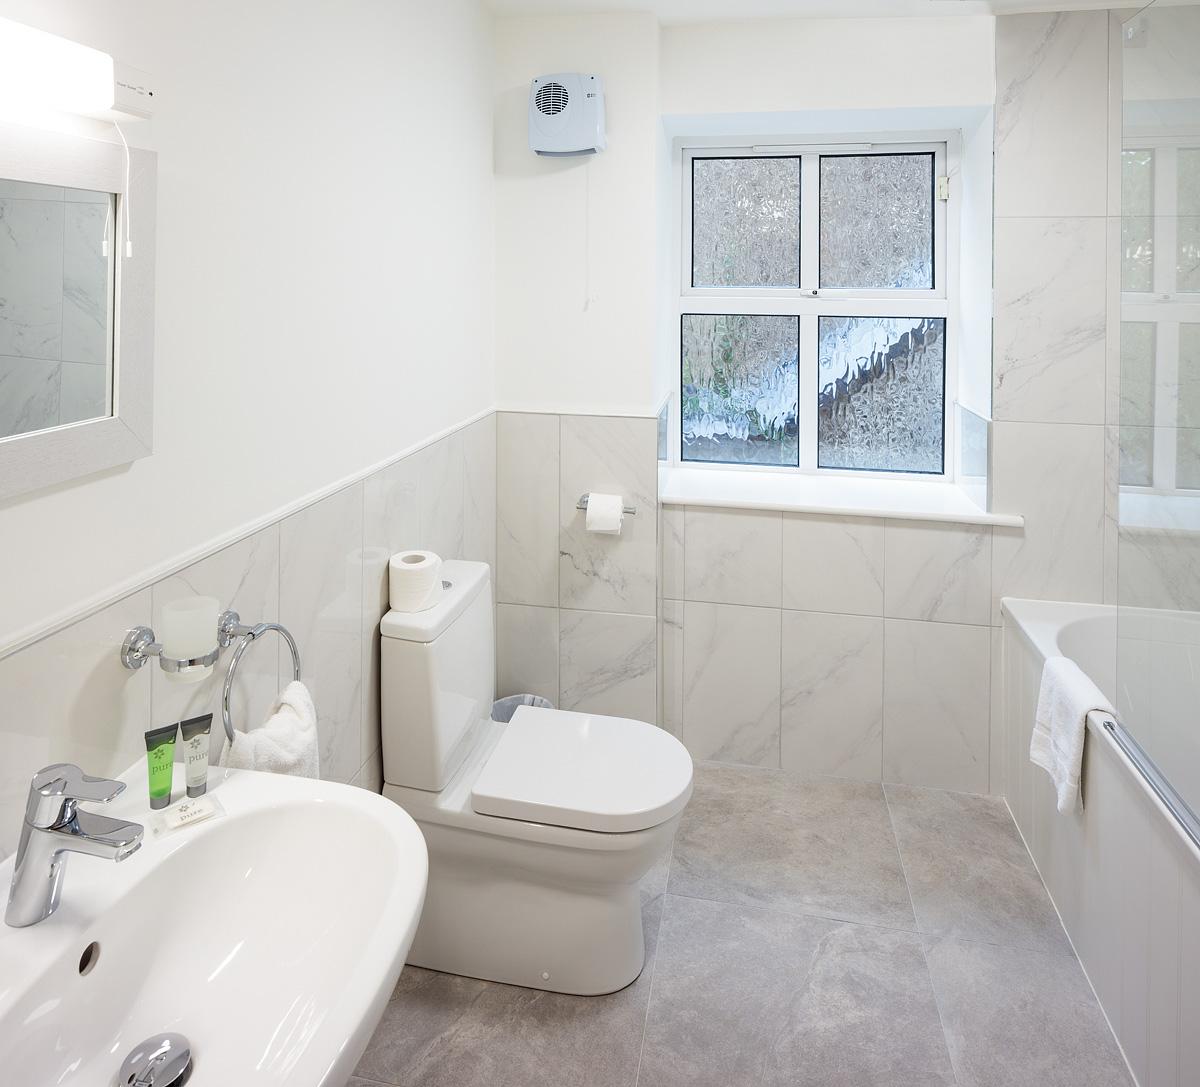 WC at Baggot Rath House Apartments, Ballsbridge, Dublin